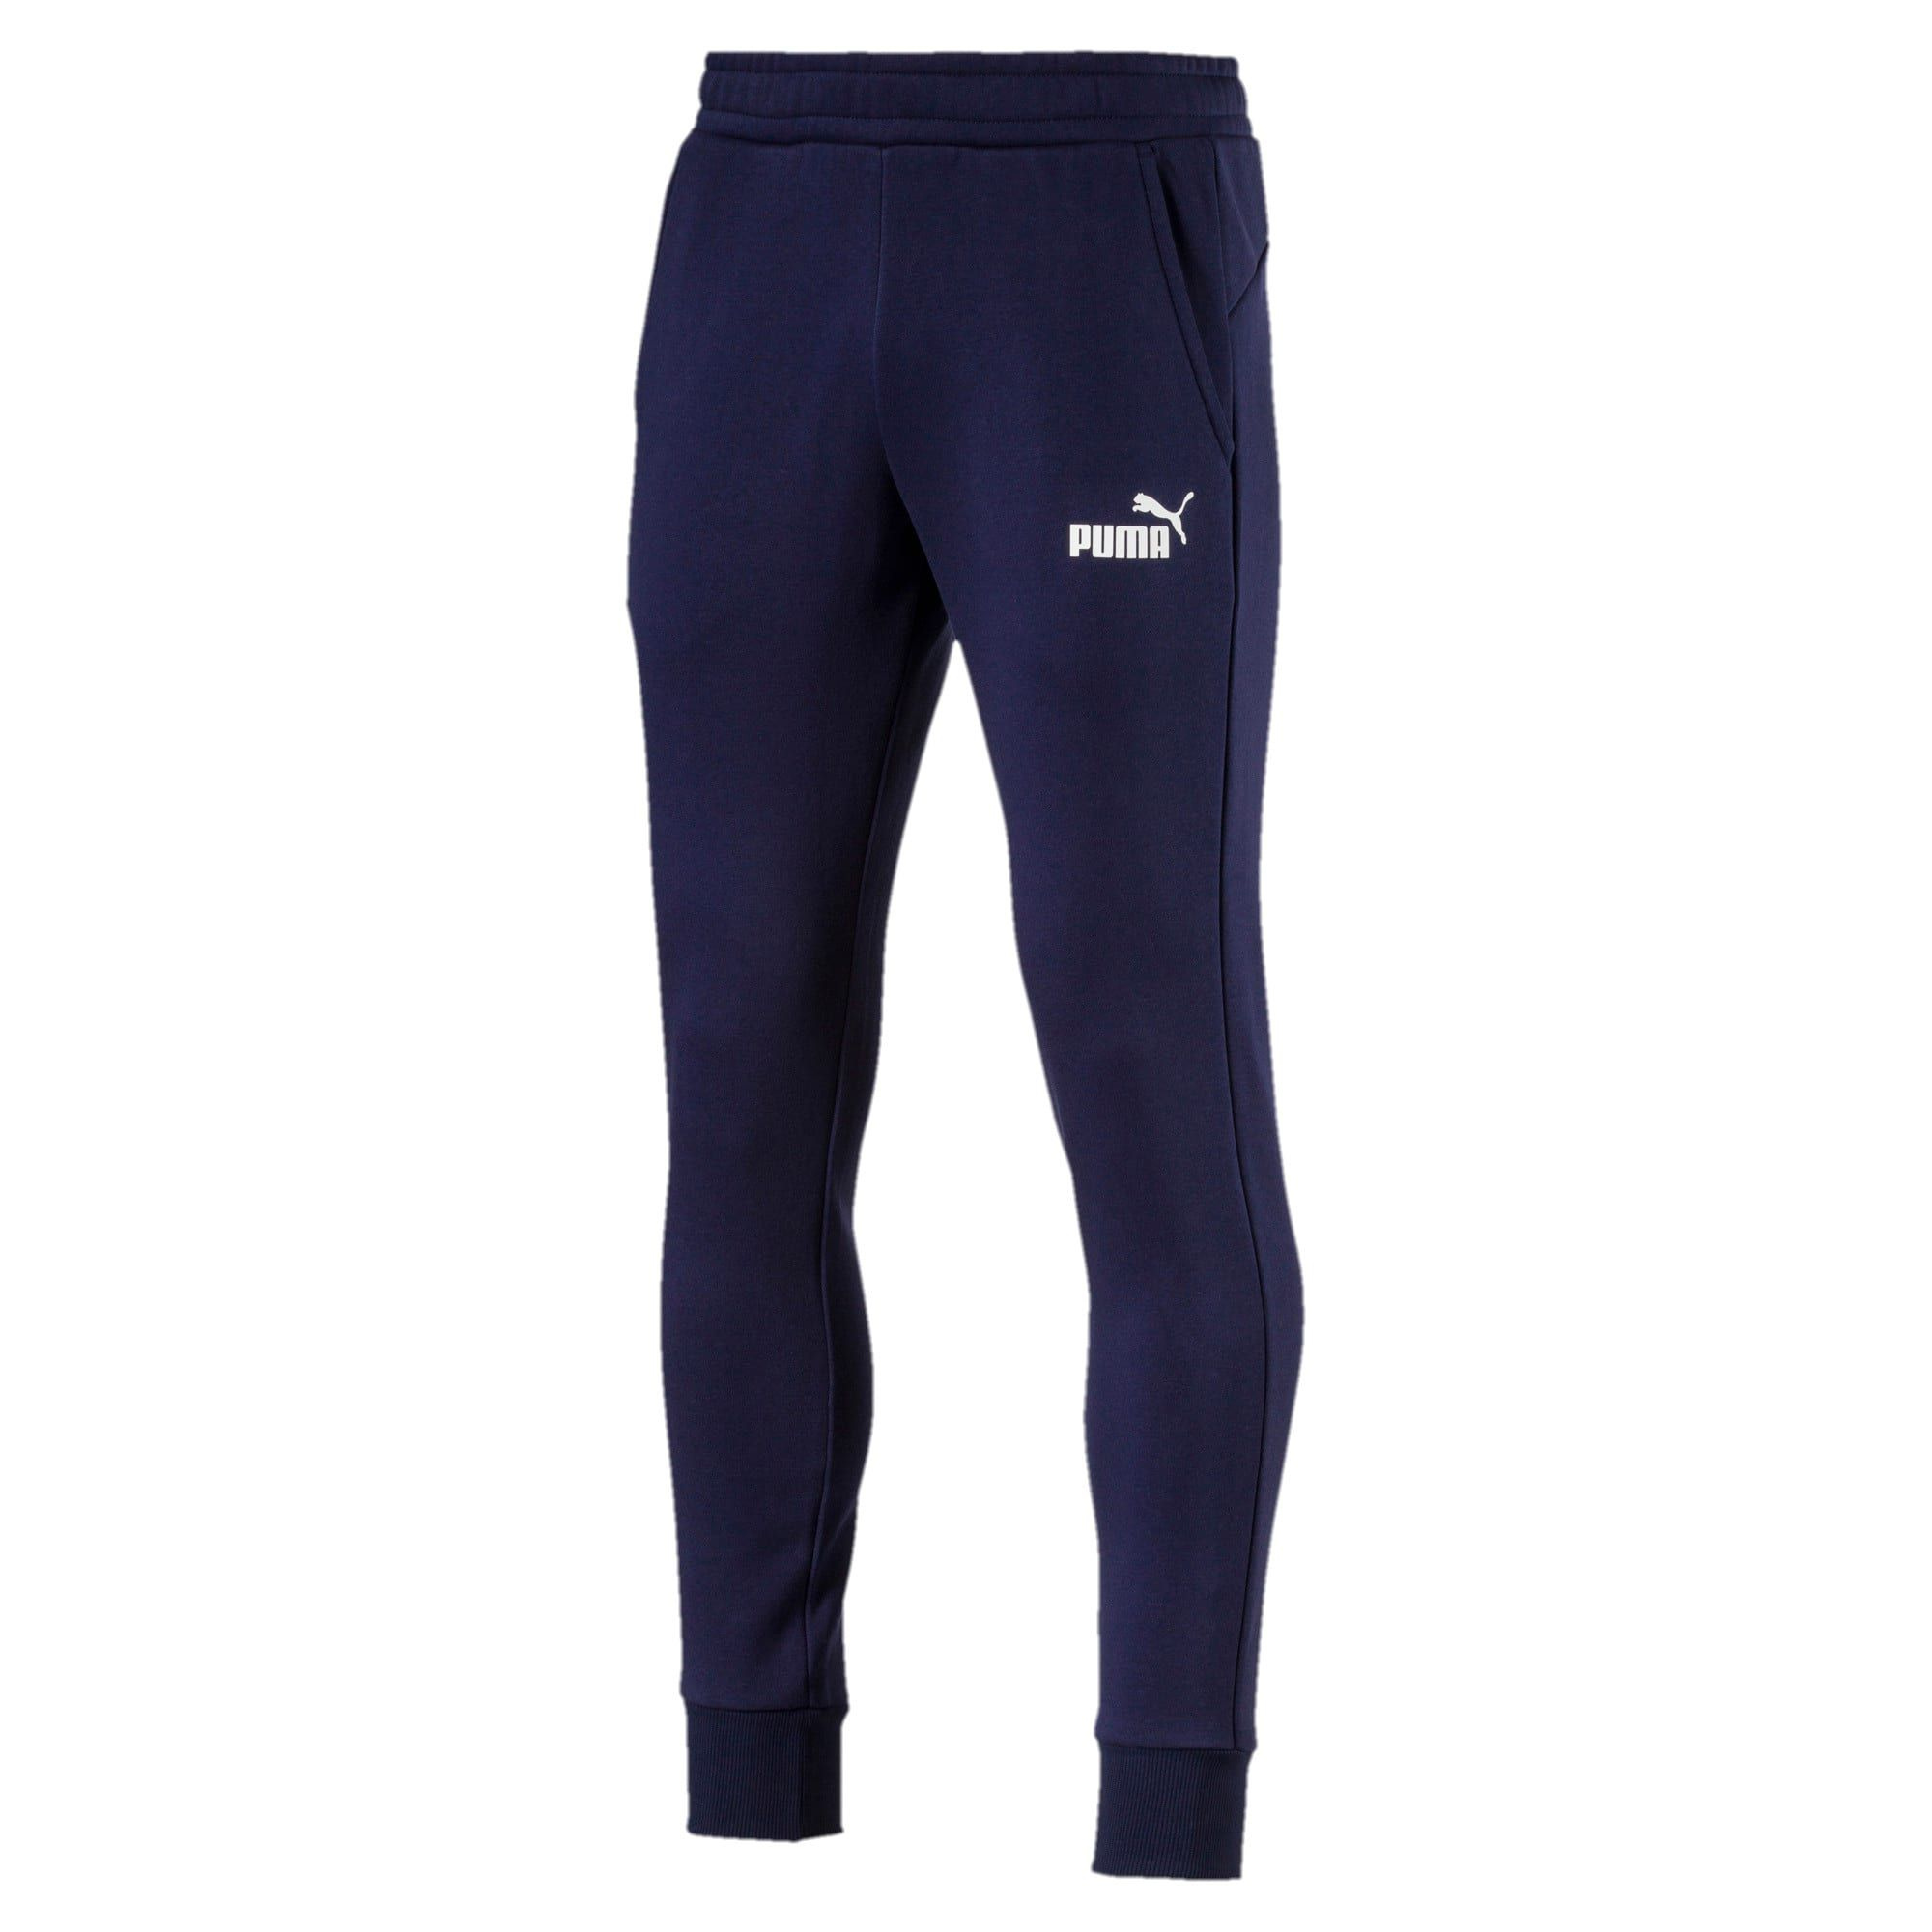 PUMA Essentials Men's Sweatpants in Peacoat size 2X Small #sweatpantsoutfit